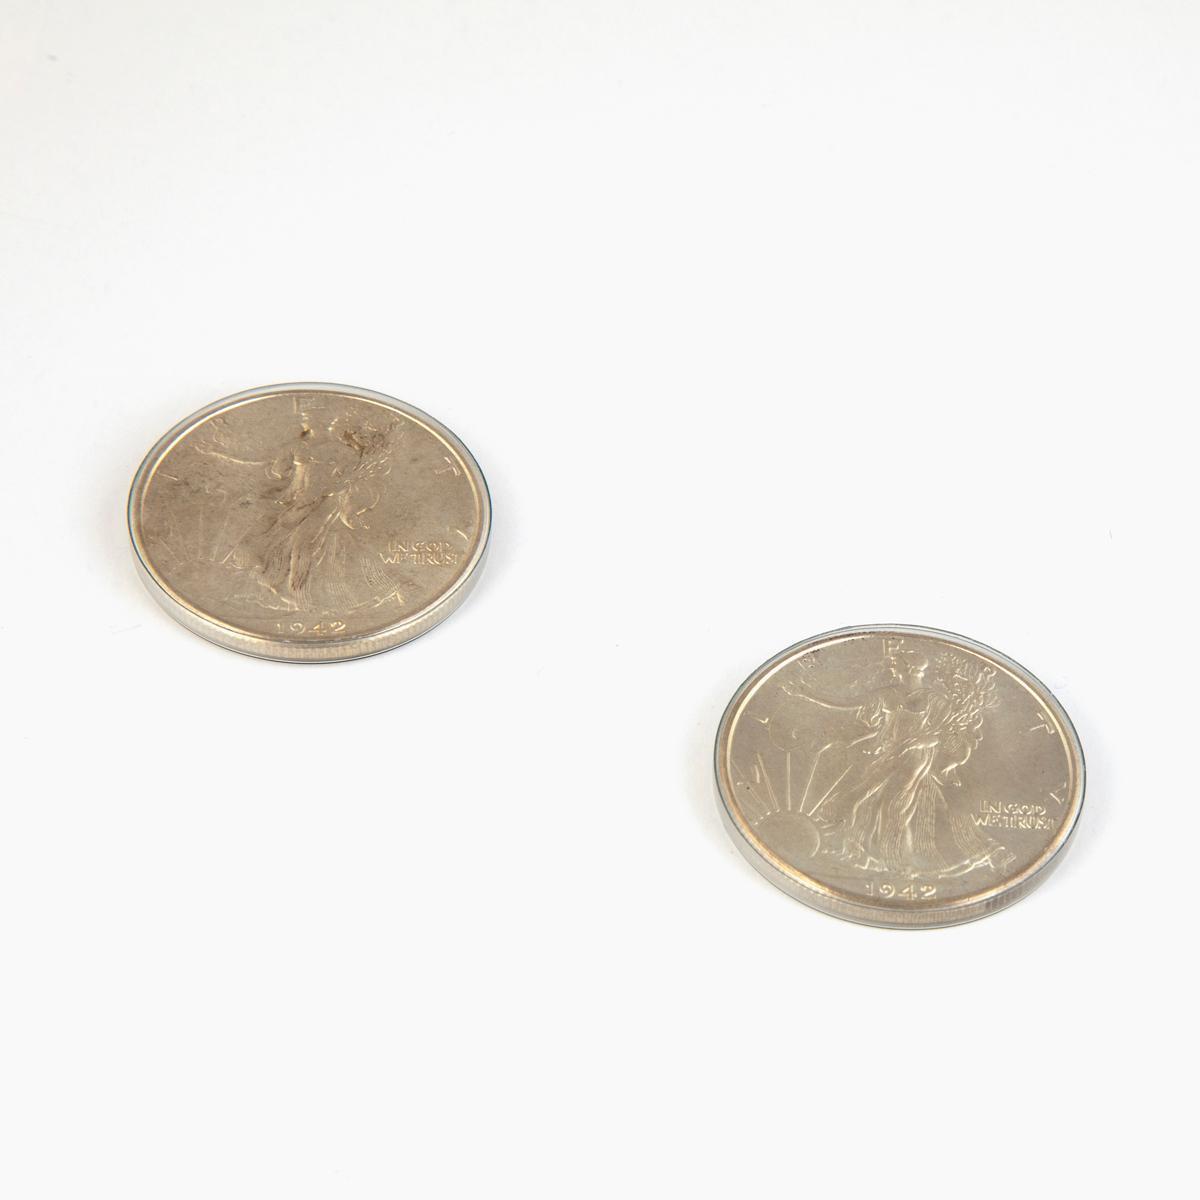 A Pair of Walking Liberty Coins, 1942